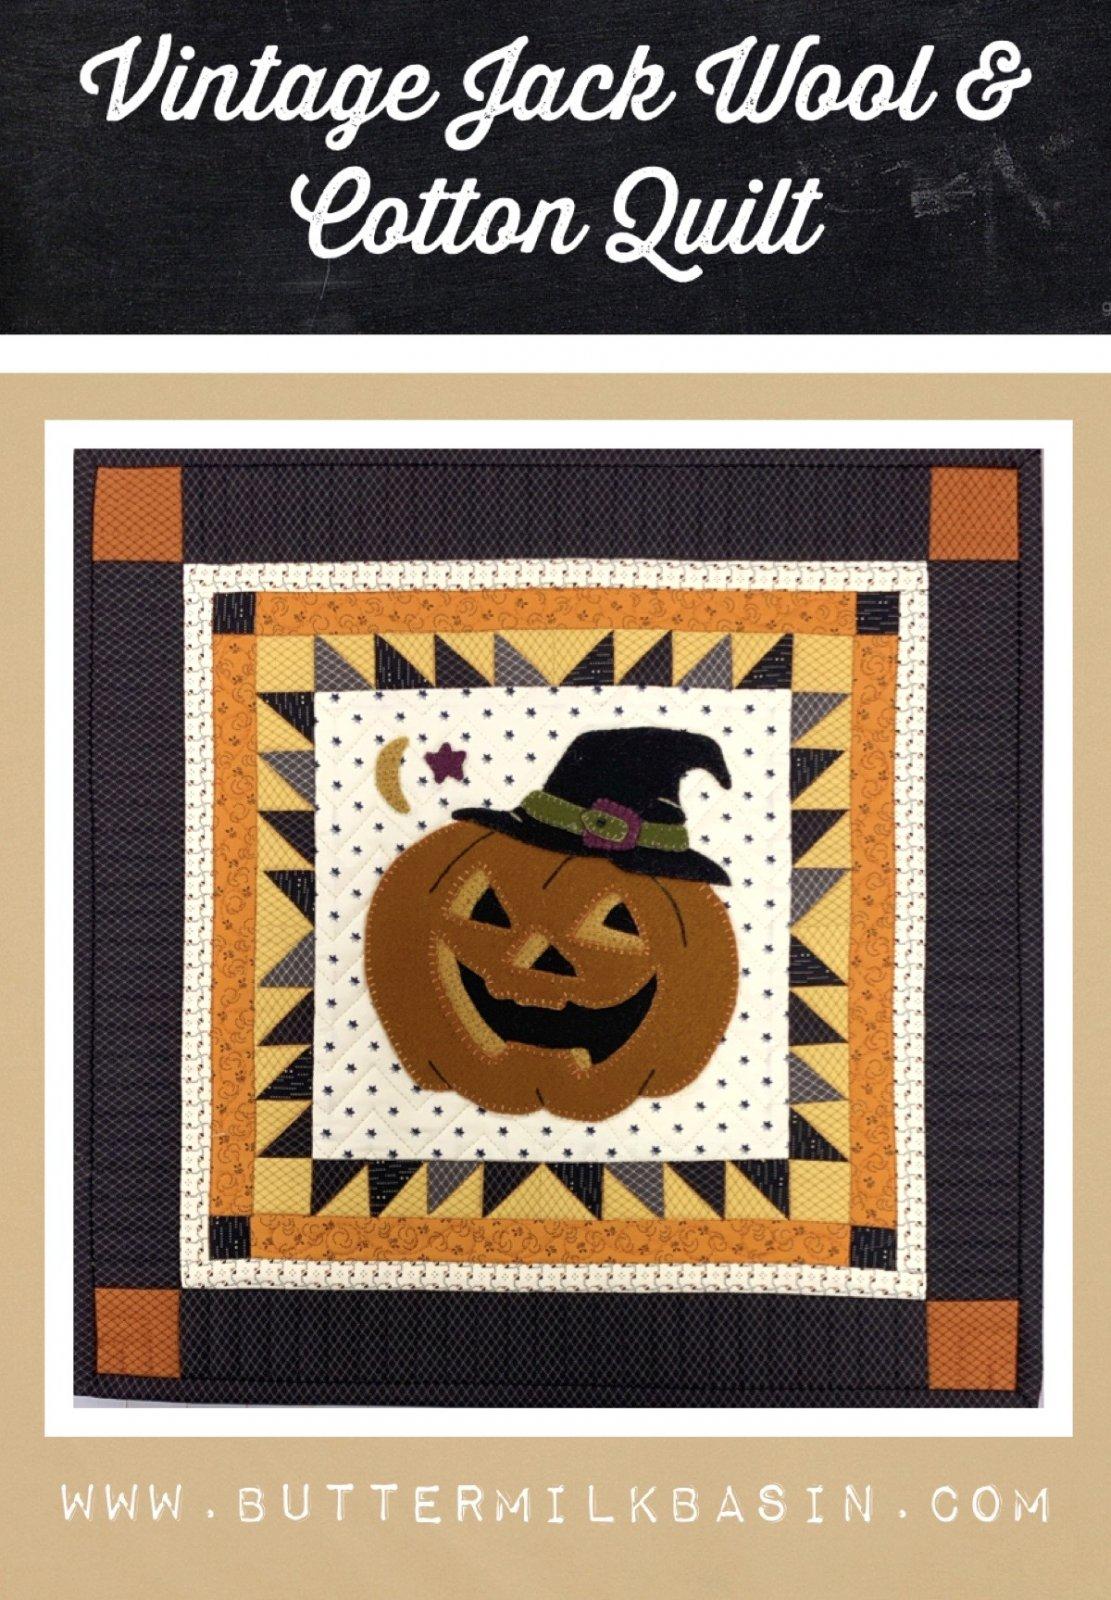 Vintage Jack Wool & Cotton Quilt * Kit & Pattern